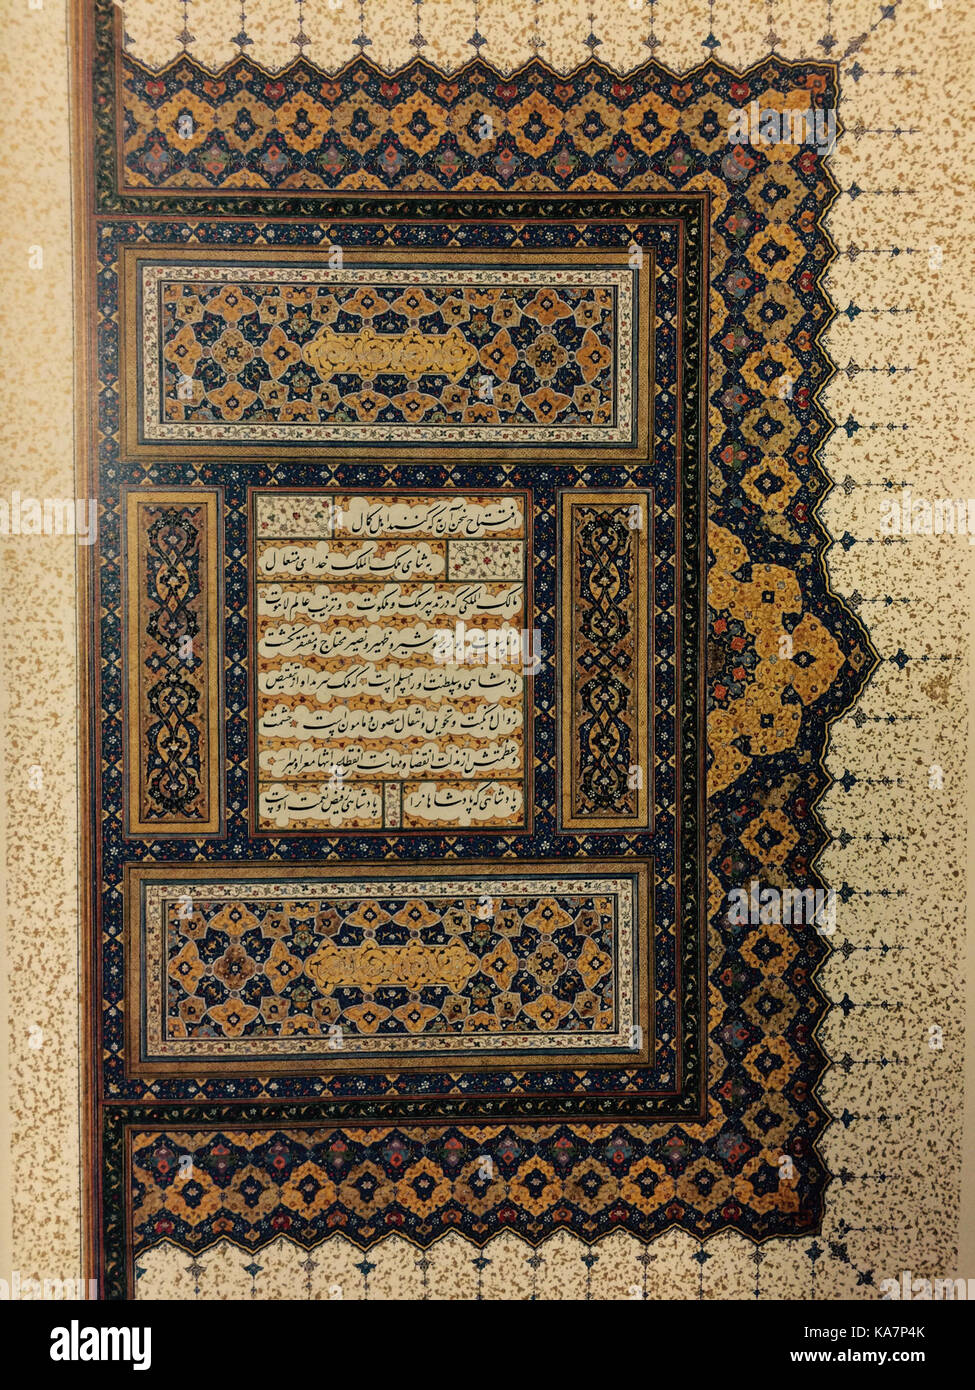 Shahnama Tahmasp folio1 - Stock Image